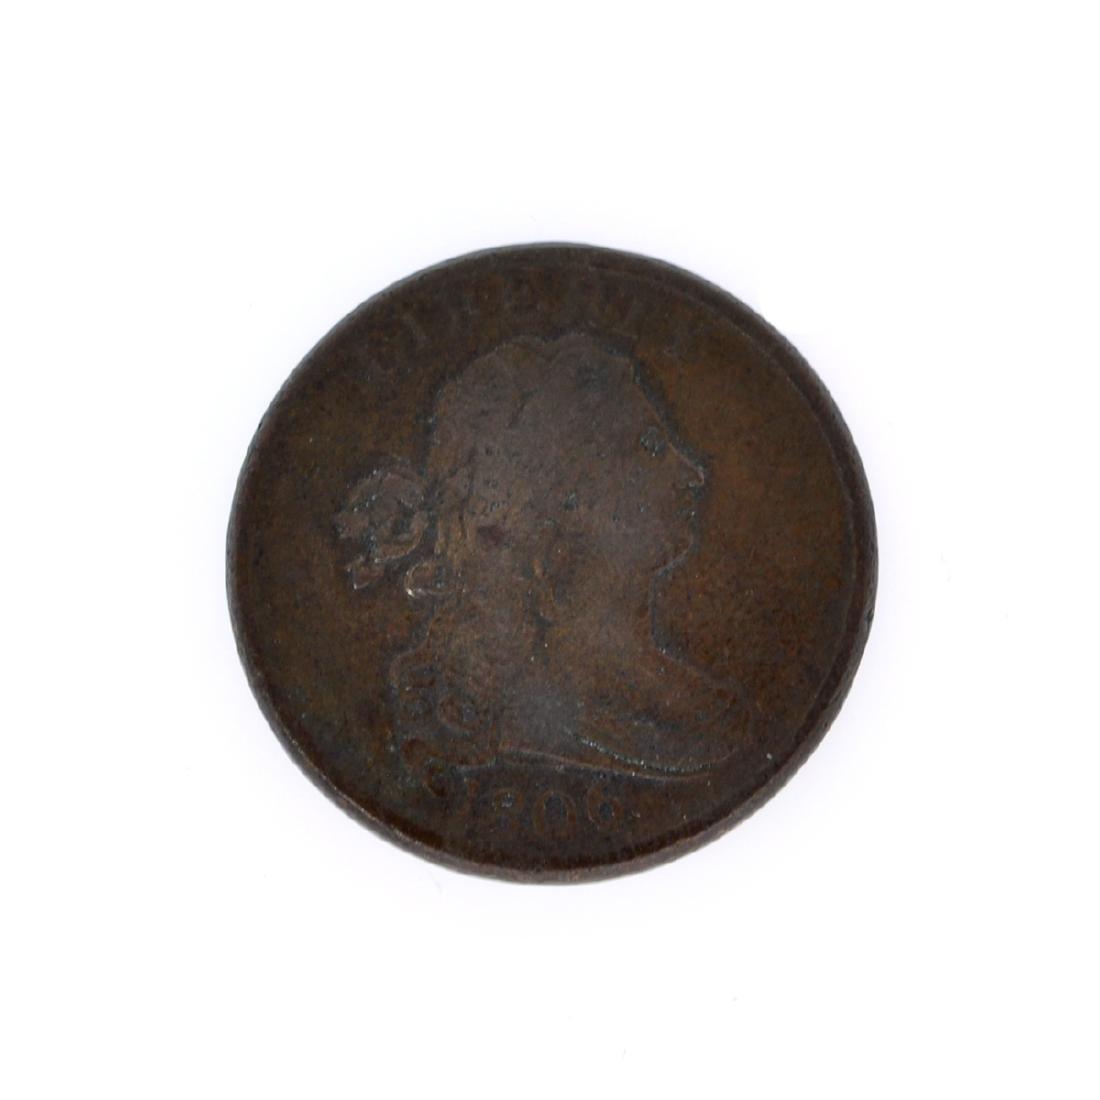 Rare 1806 Draped Bust Half Cent Coin